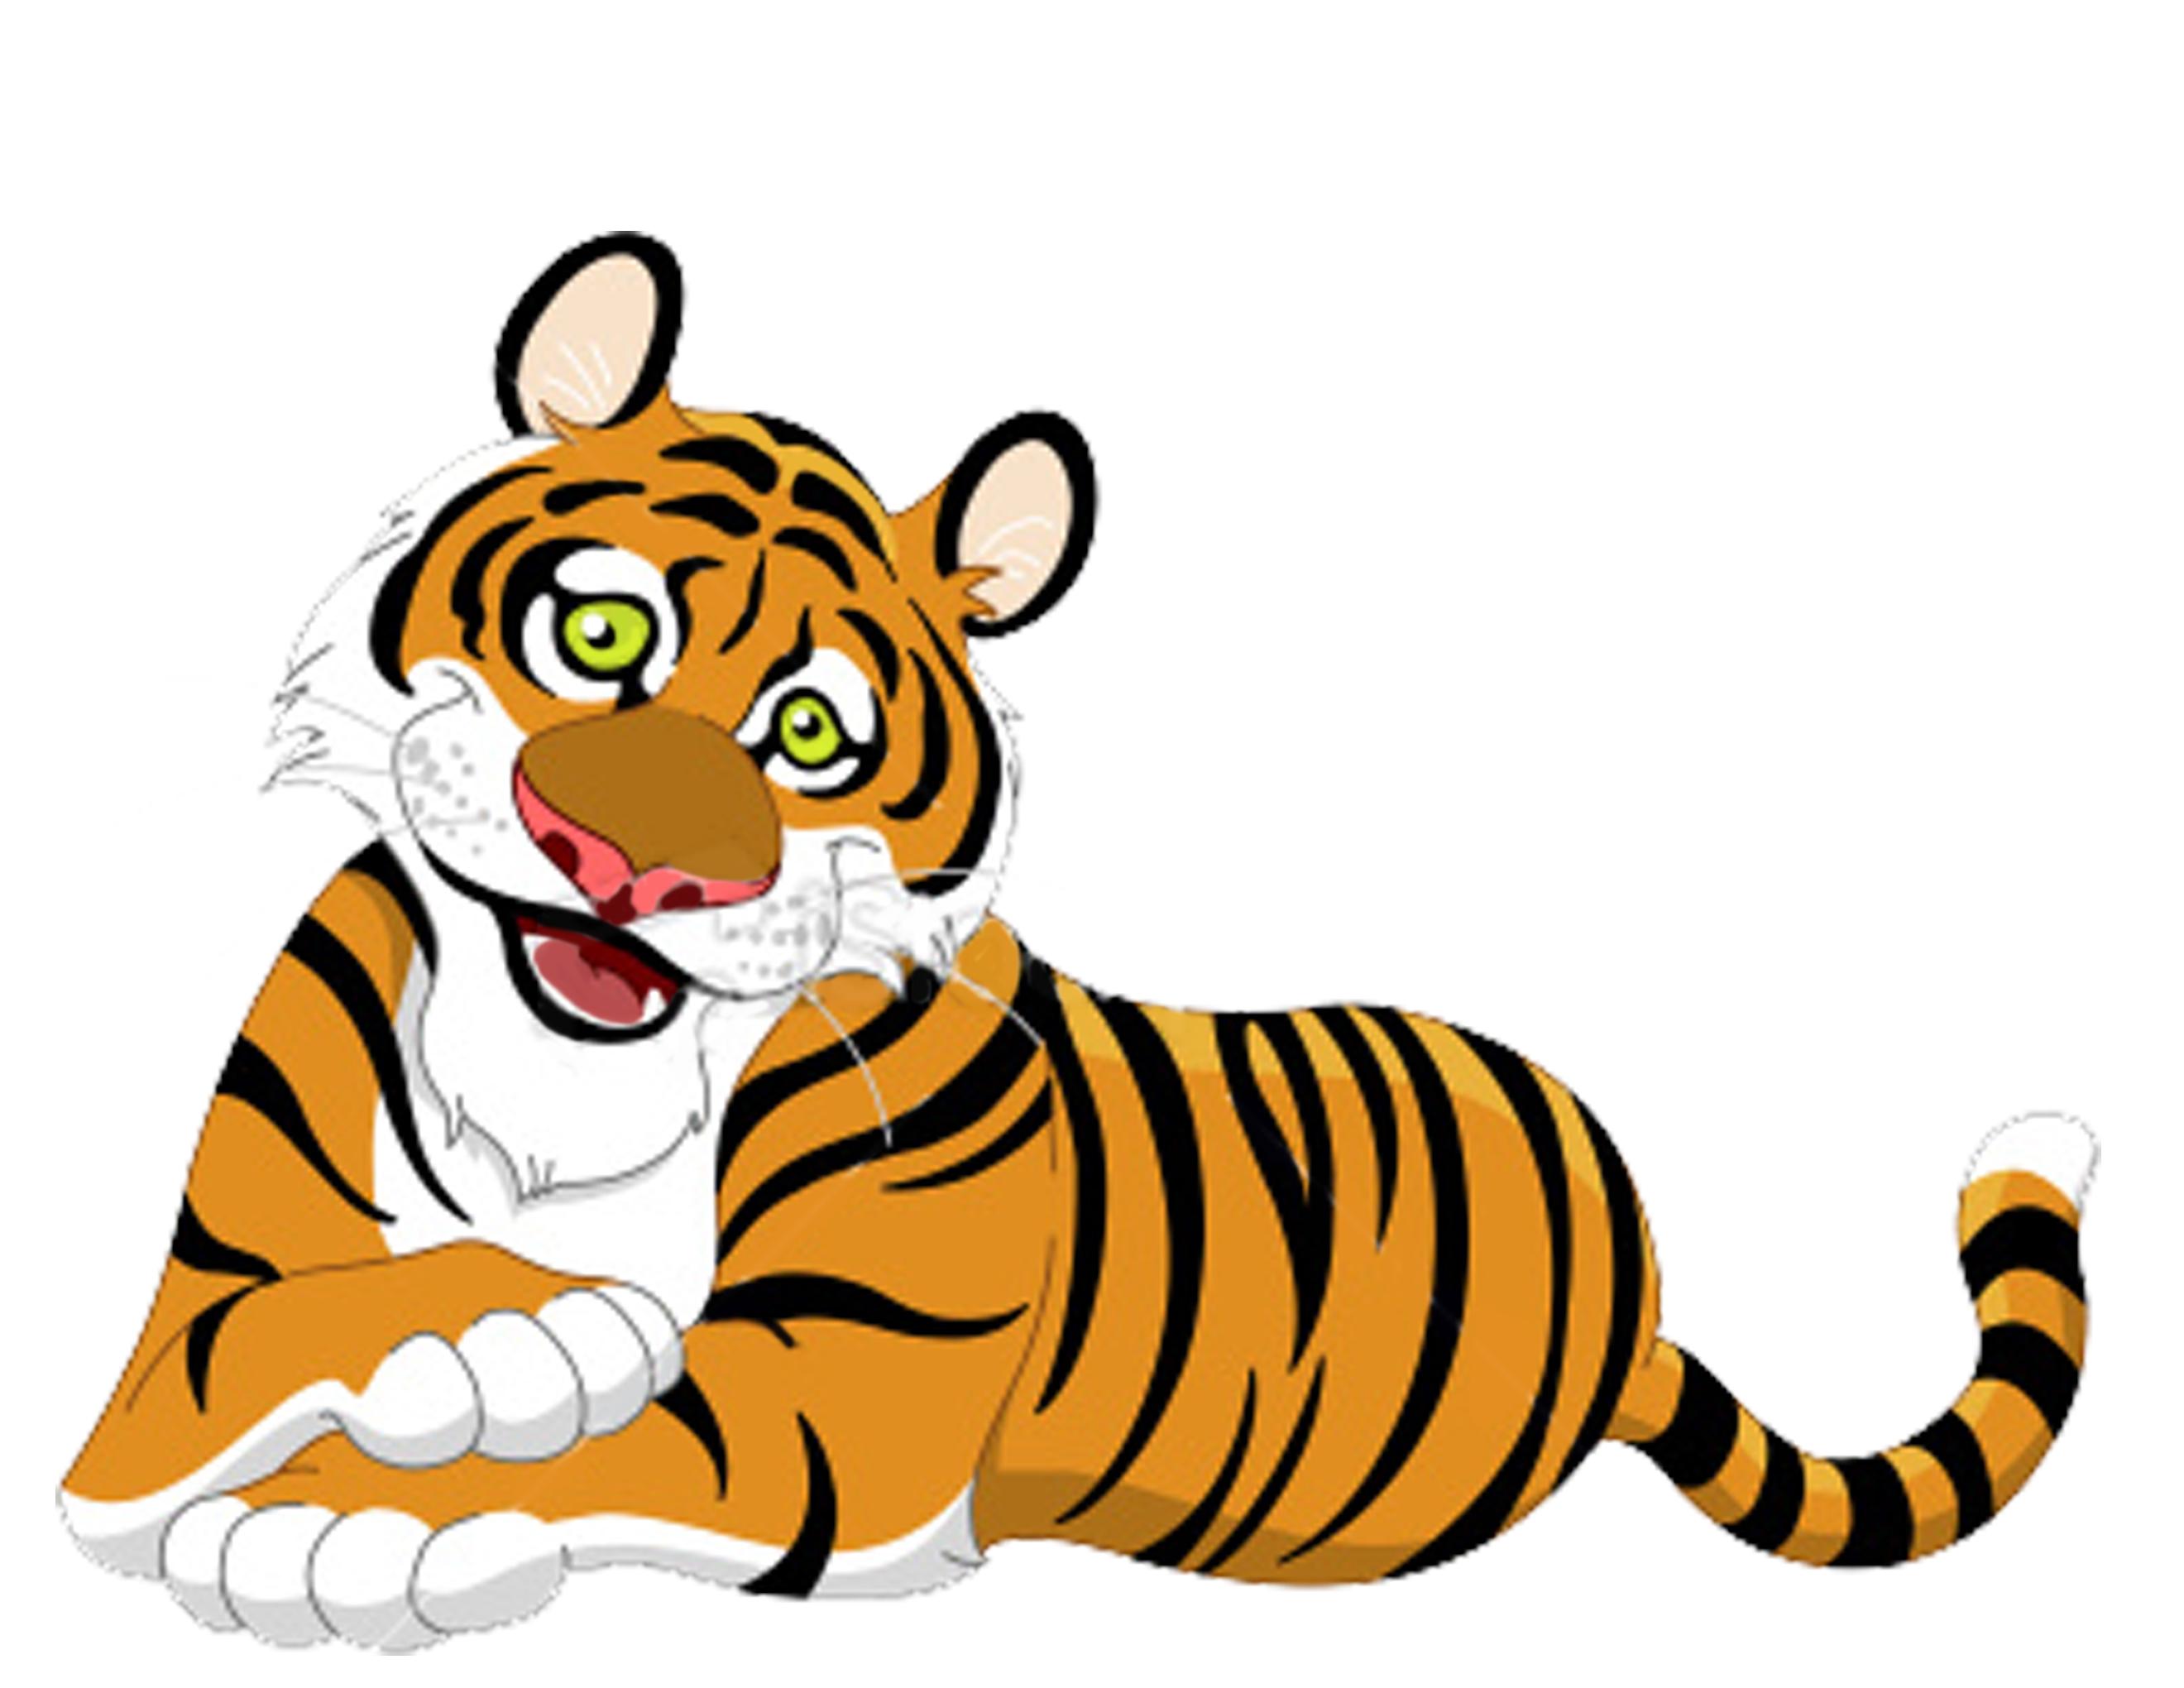 2640x2040 Tiger Clip Art Images Free Clipart 3